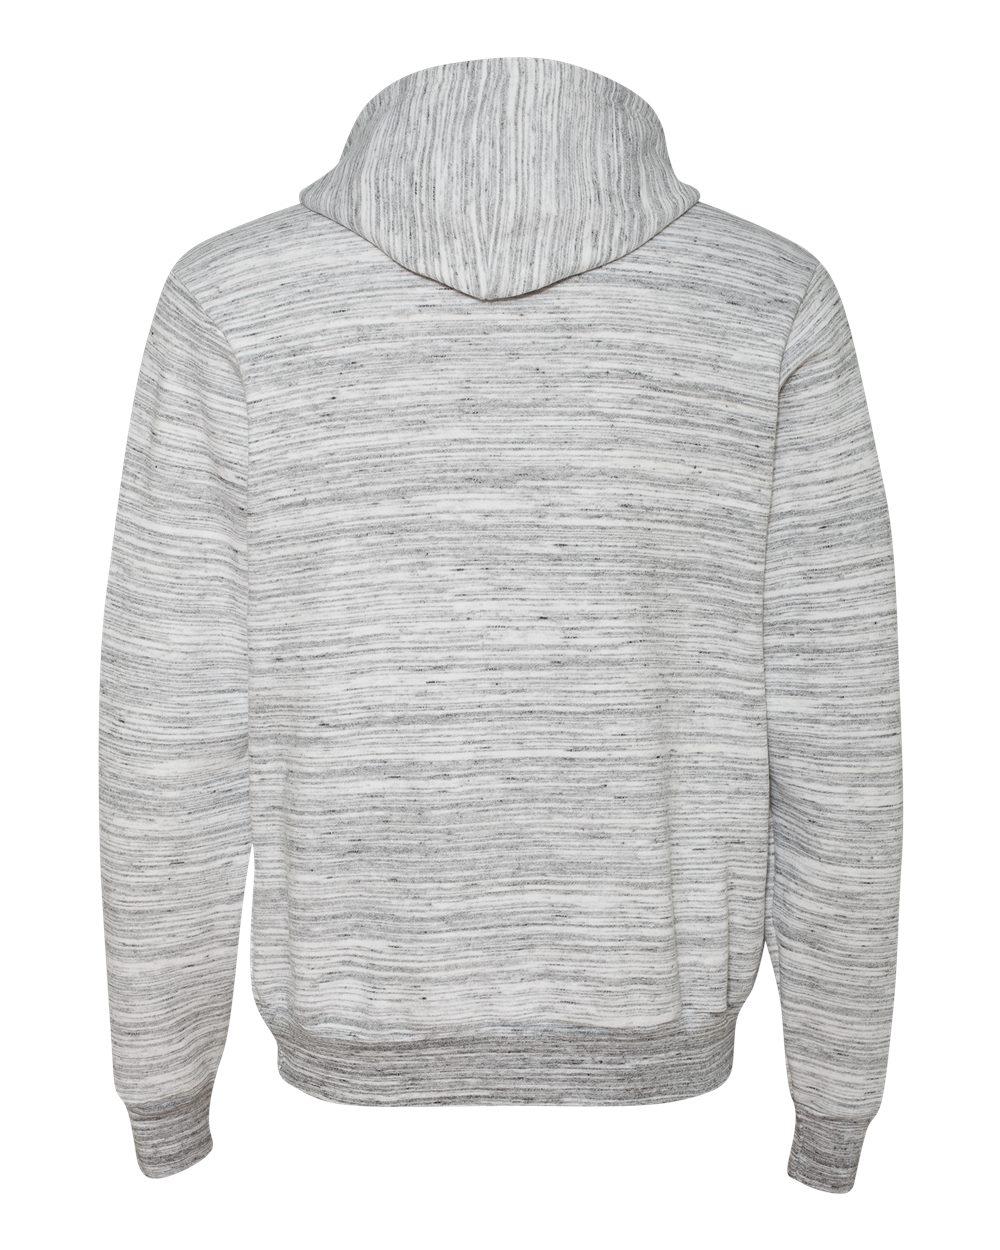 Bella-Canvas-Unisex-Sponge-Hooded-Pullover-Sweatshirt-Blank-3719-up-to-2XL thumbnail 67